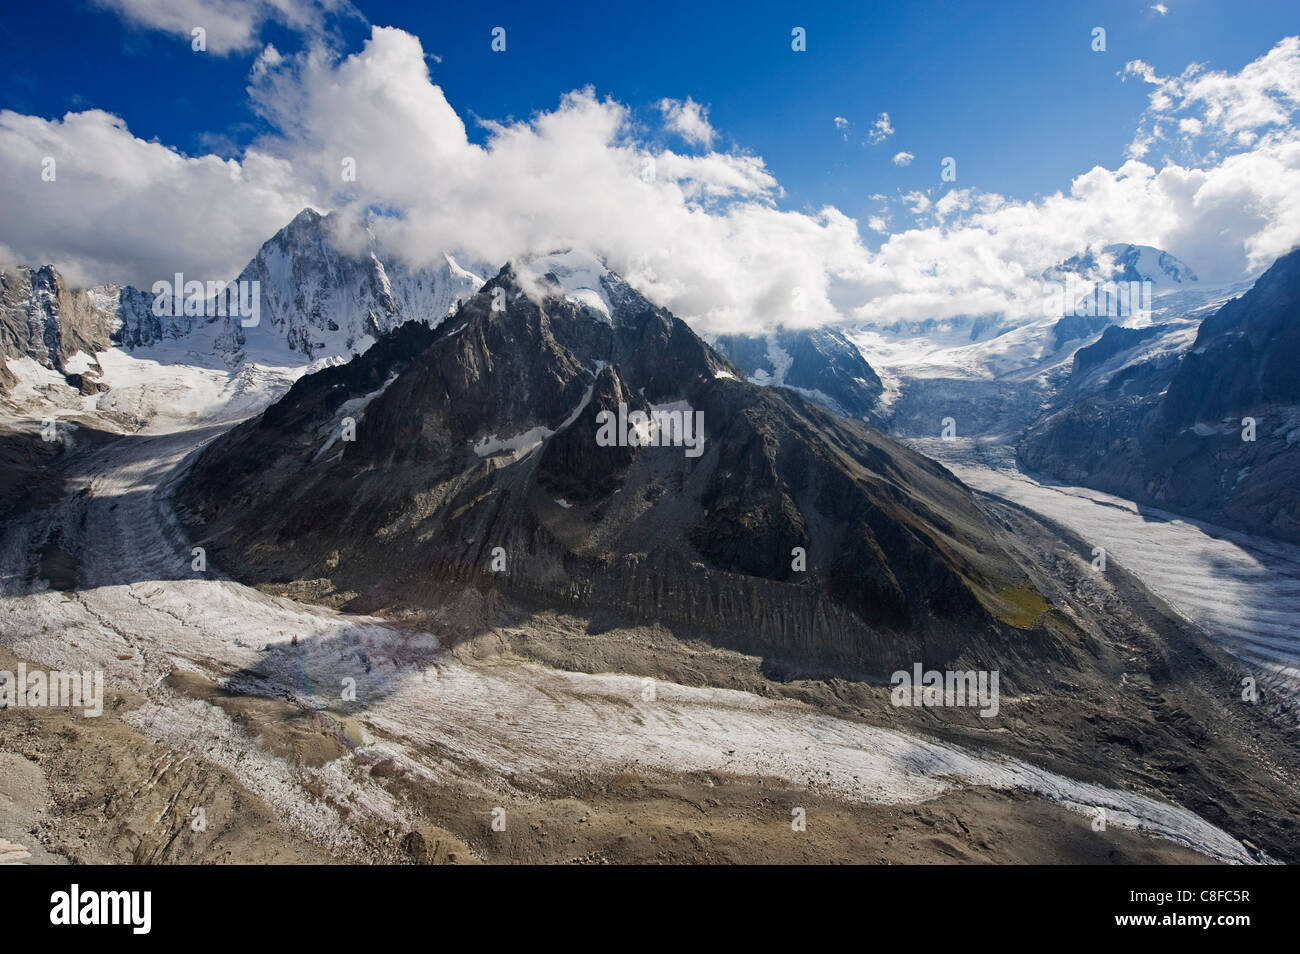 Mer de Glace glacier, Mont Blanc range, Chamonix, French Alps, France - Stock Image